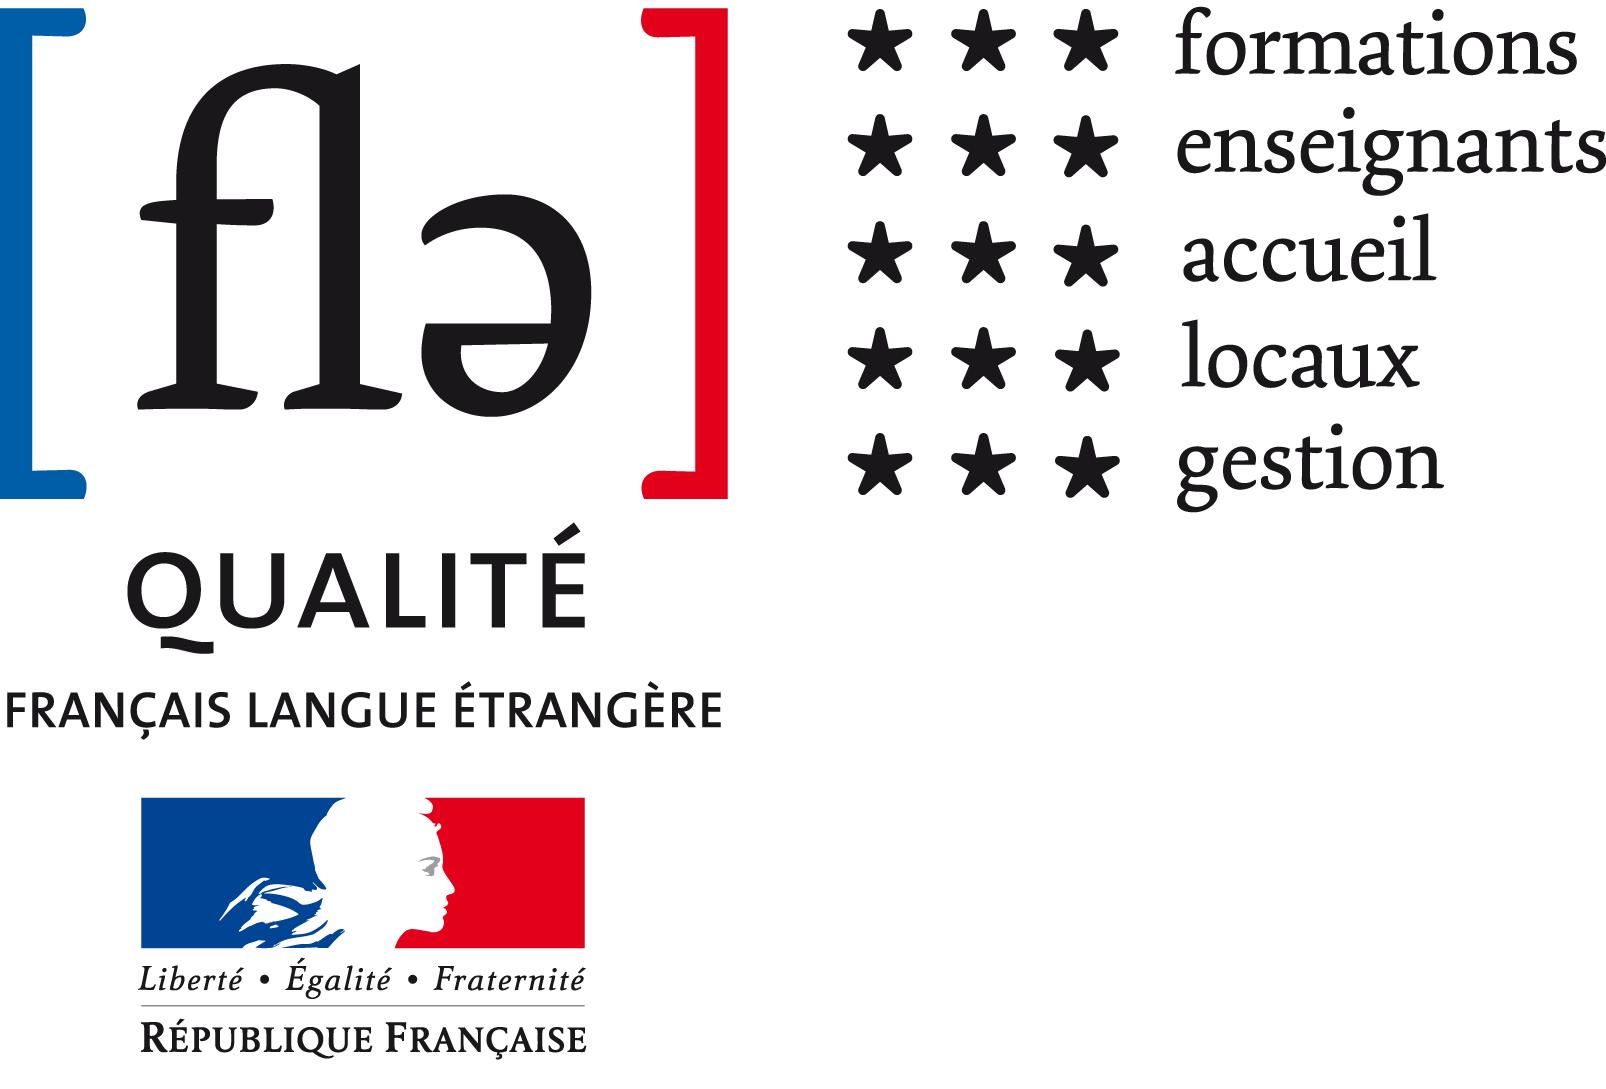 Logo fle 15 stars 2016